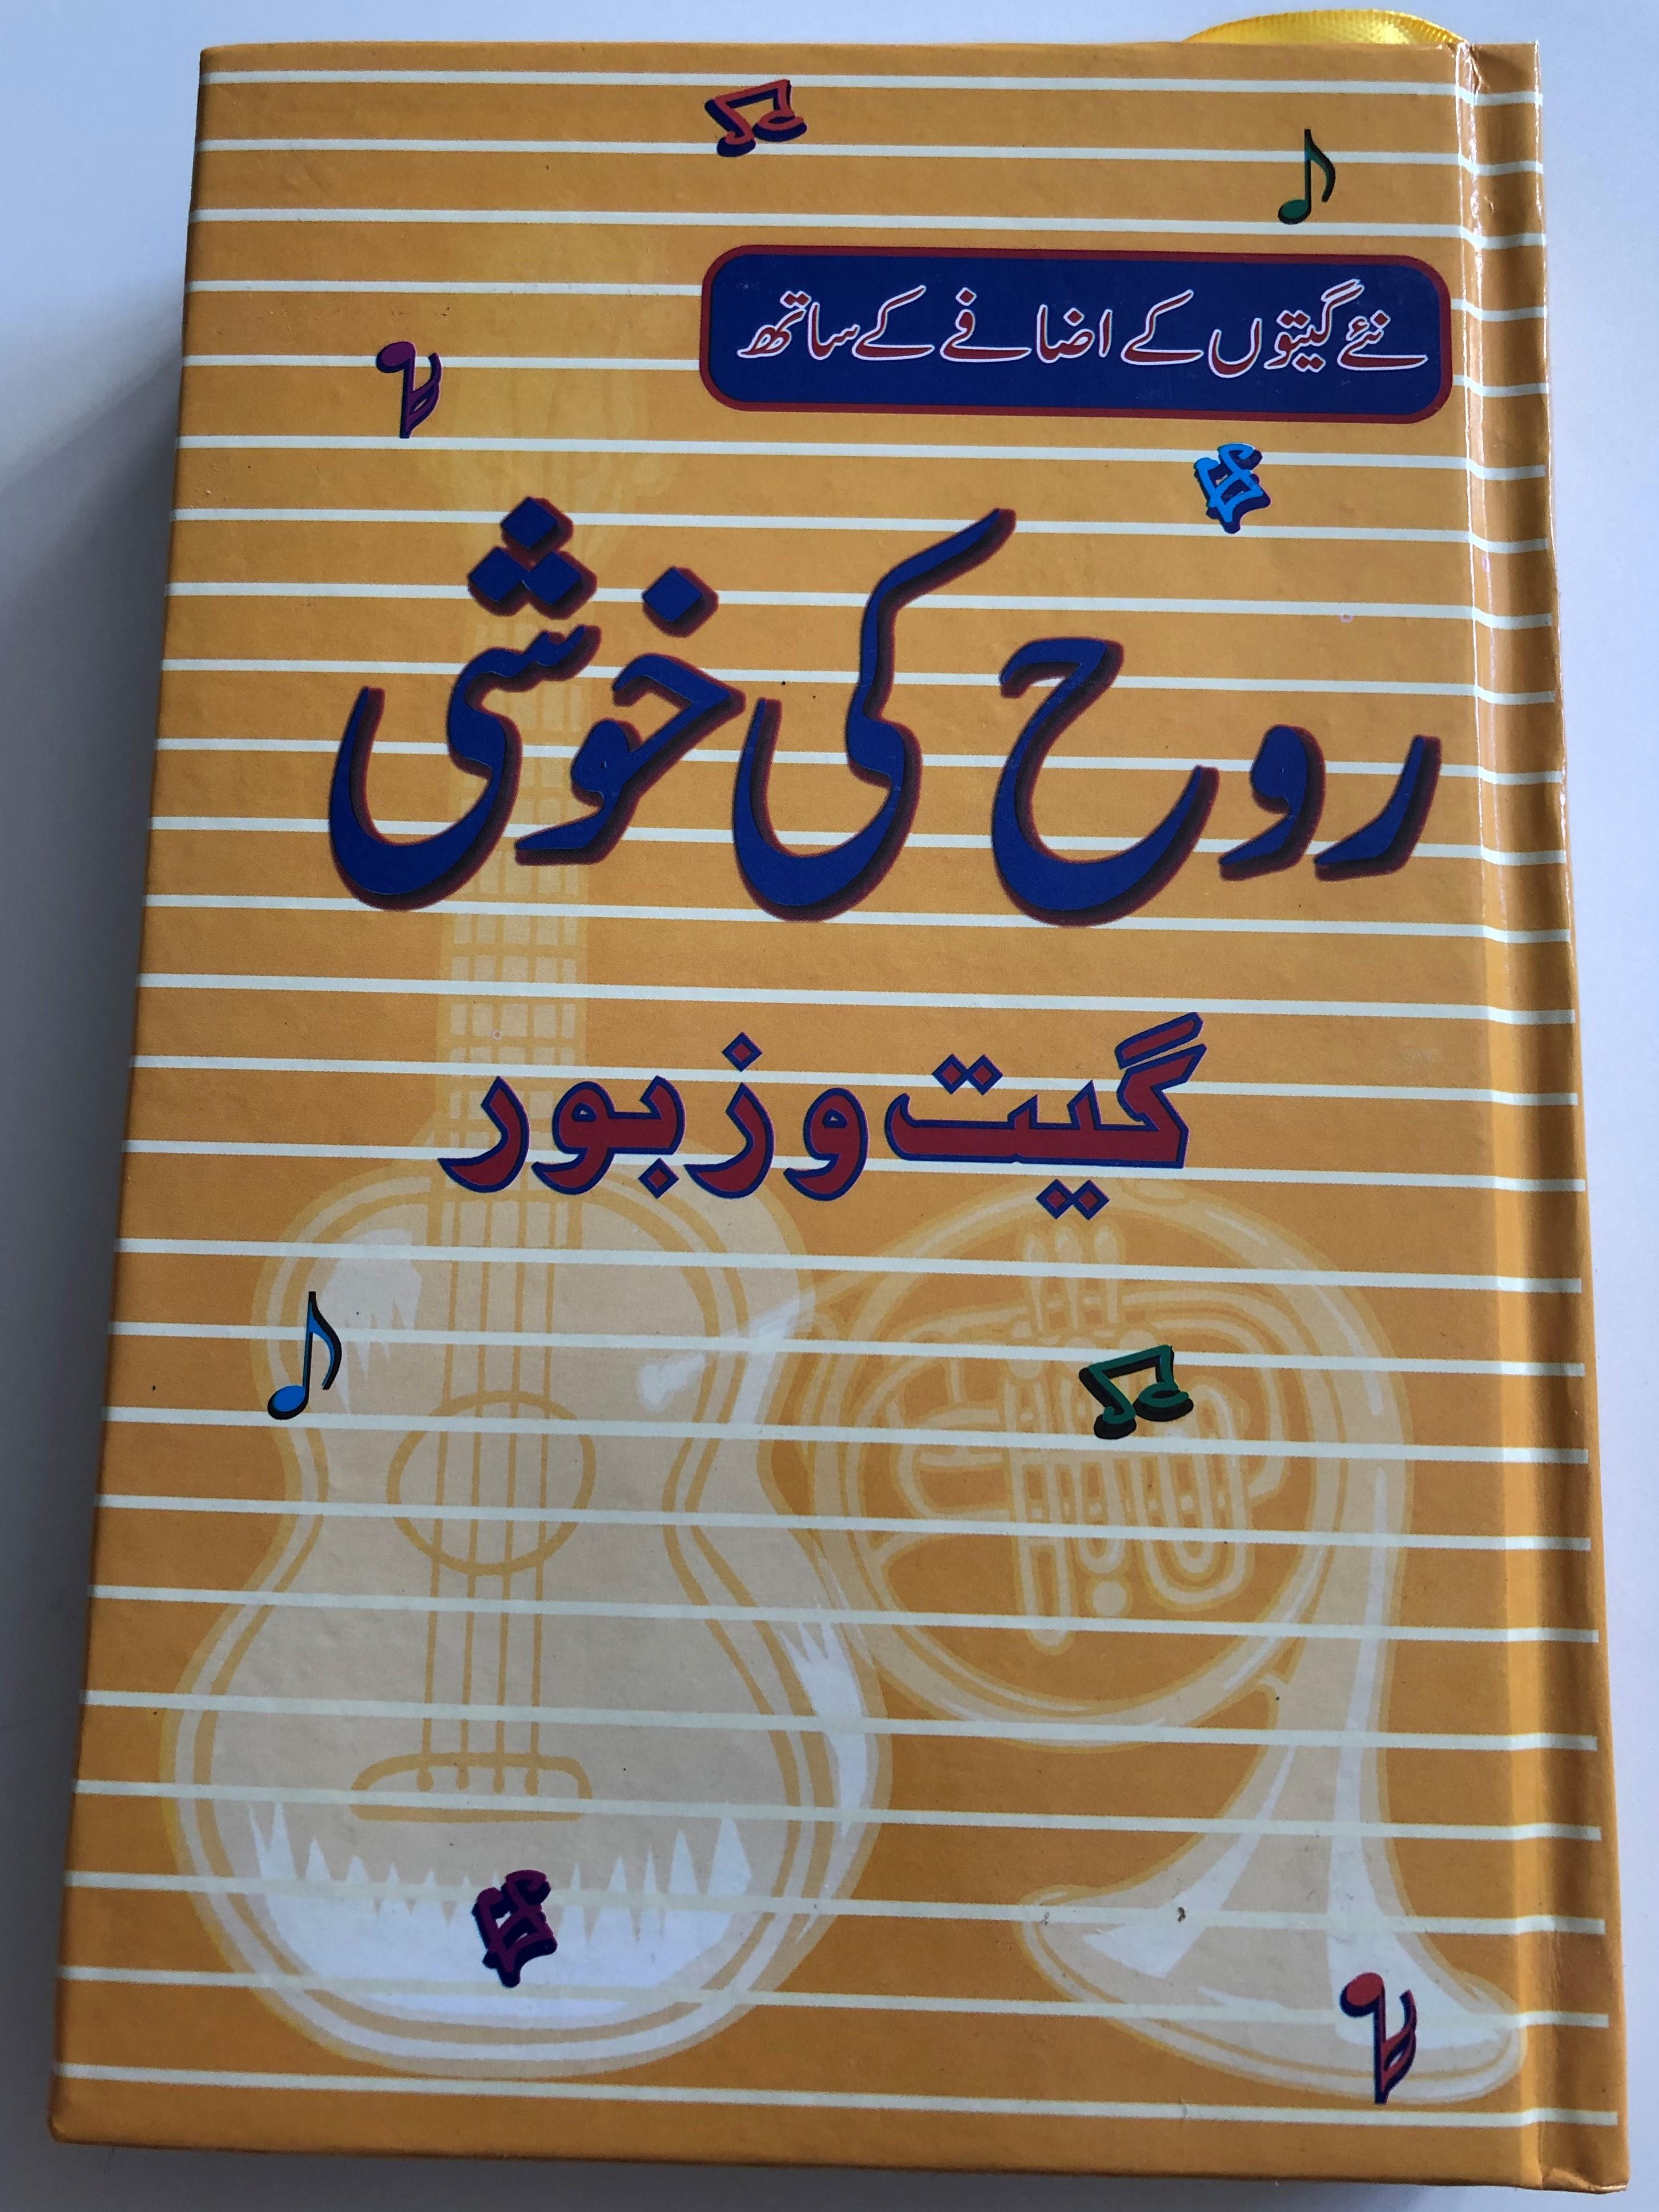 urdu-hymn-book-ruh-ki-khushi-songs-zaboor-1-.jpg